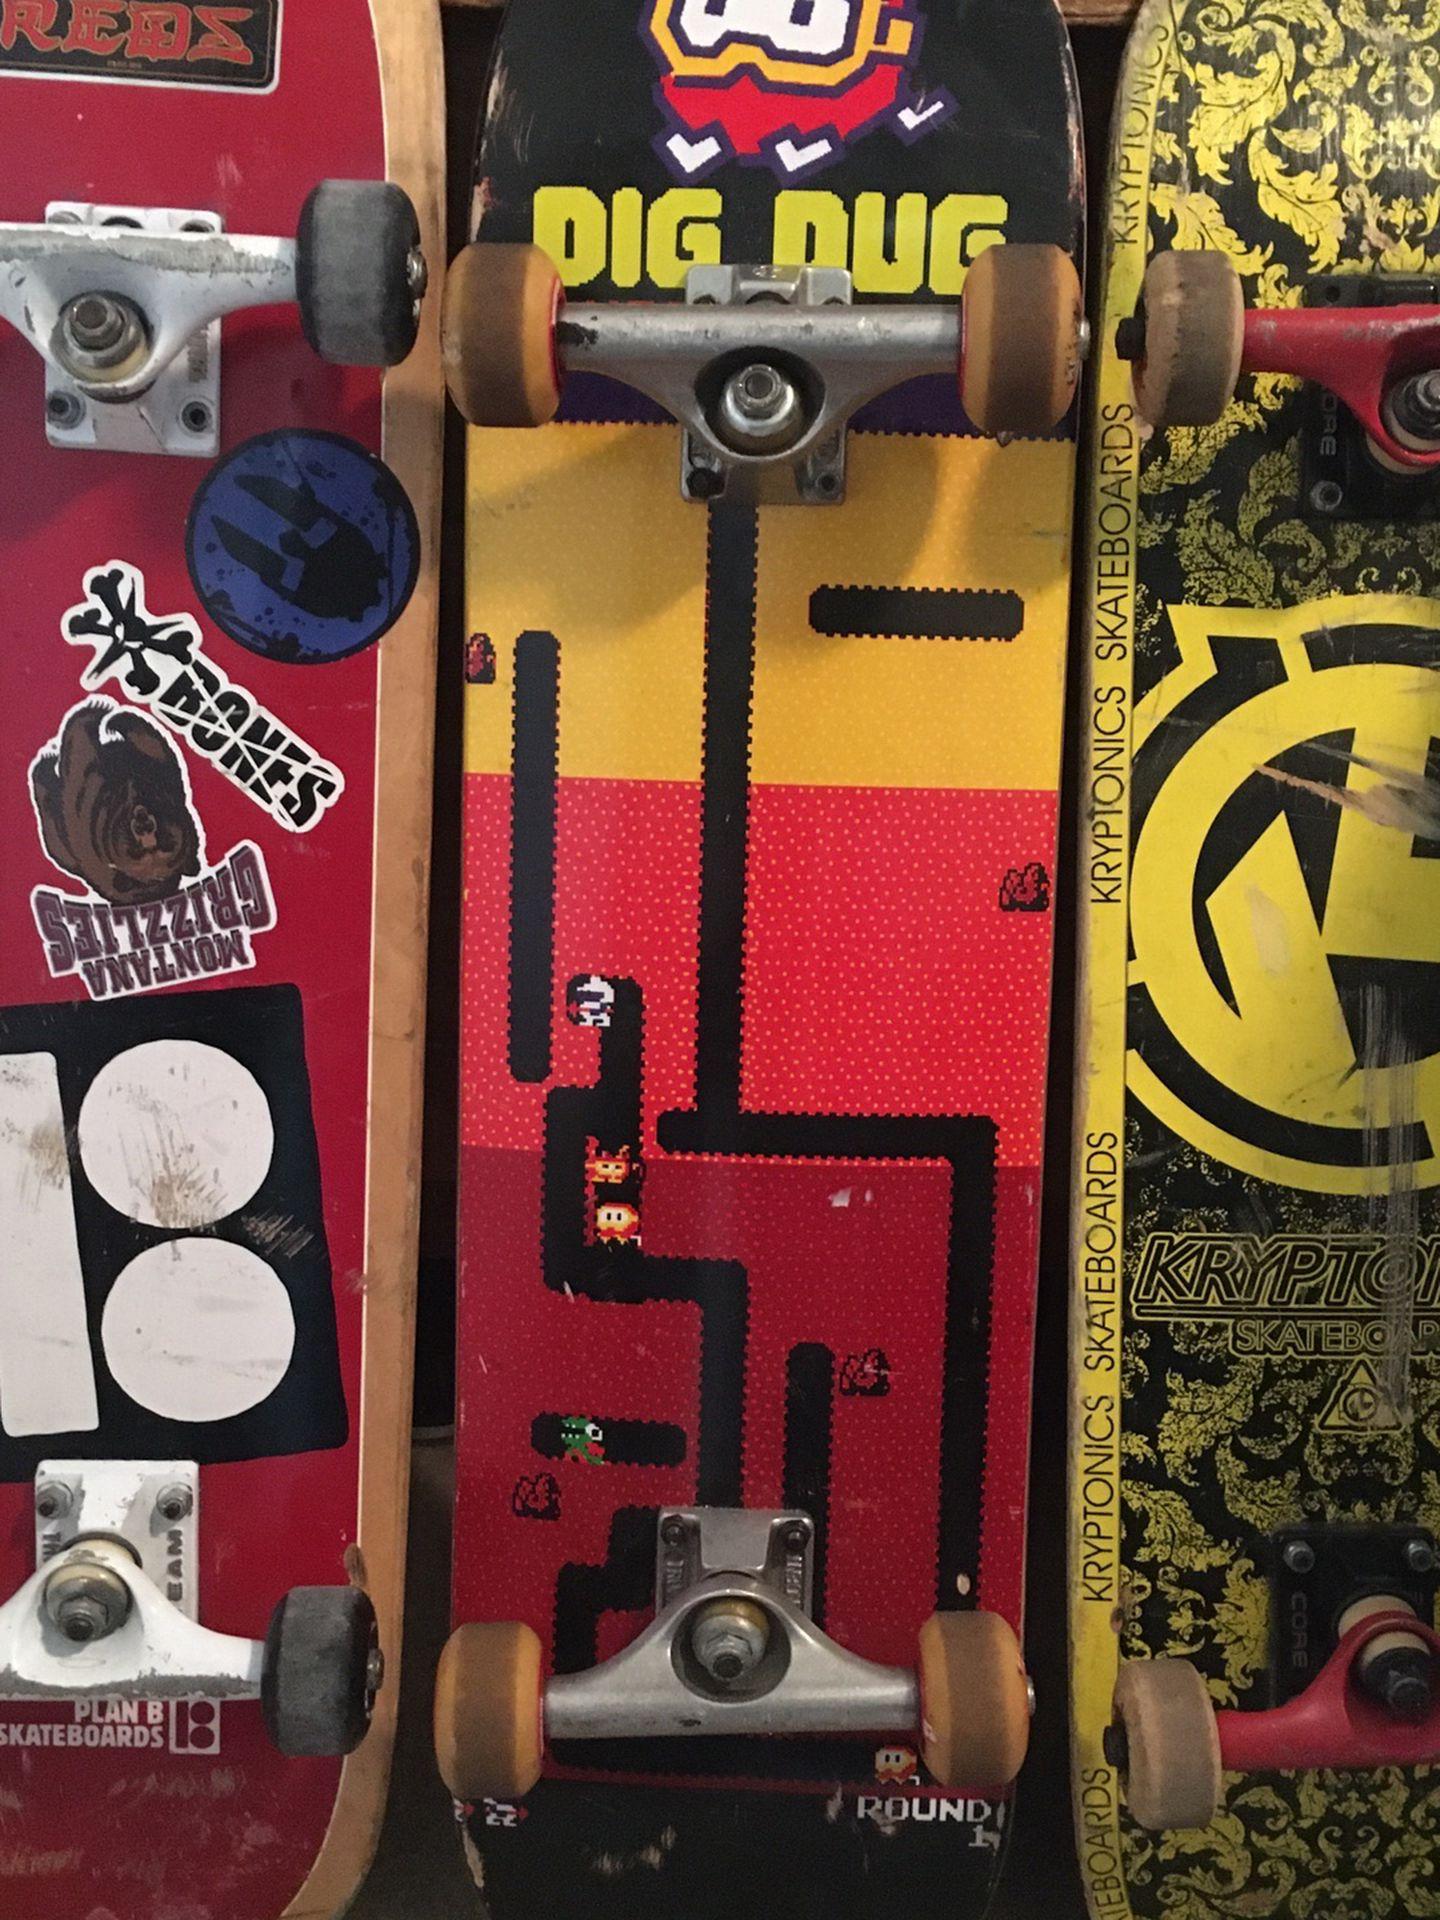 Skateboards: Plan B, Dig Dug, Kryptonic